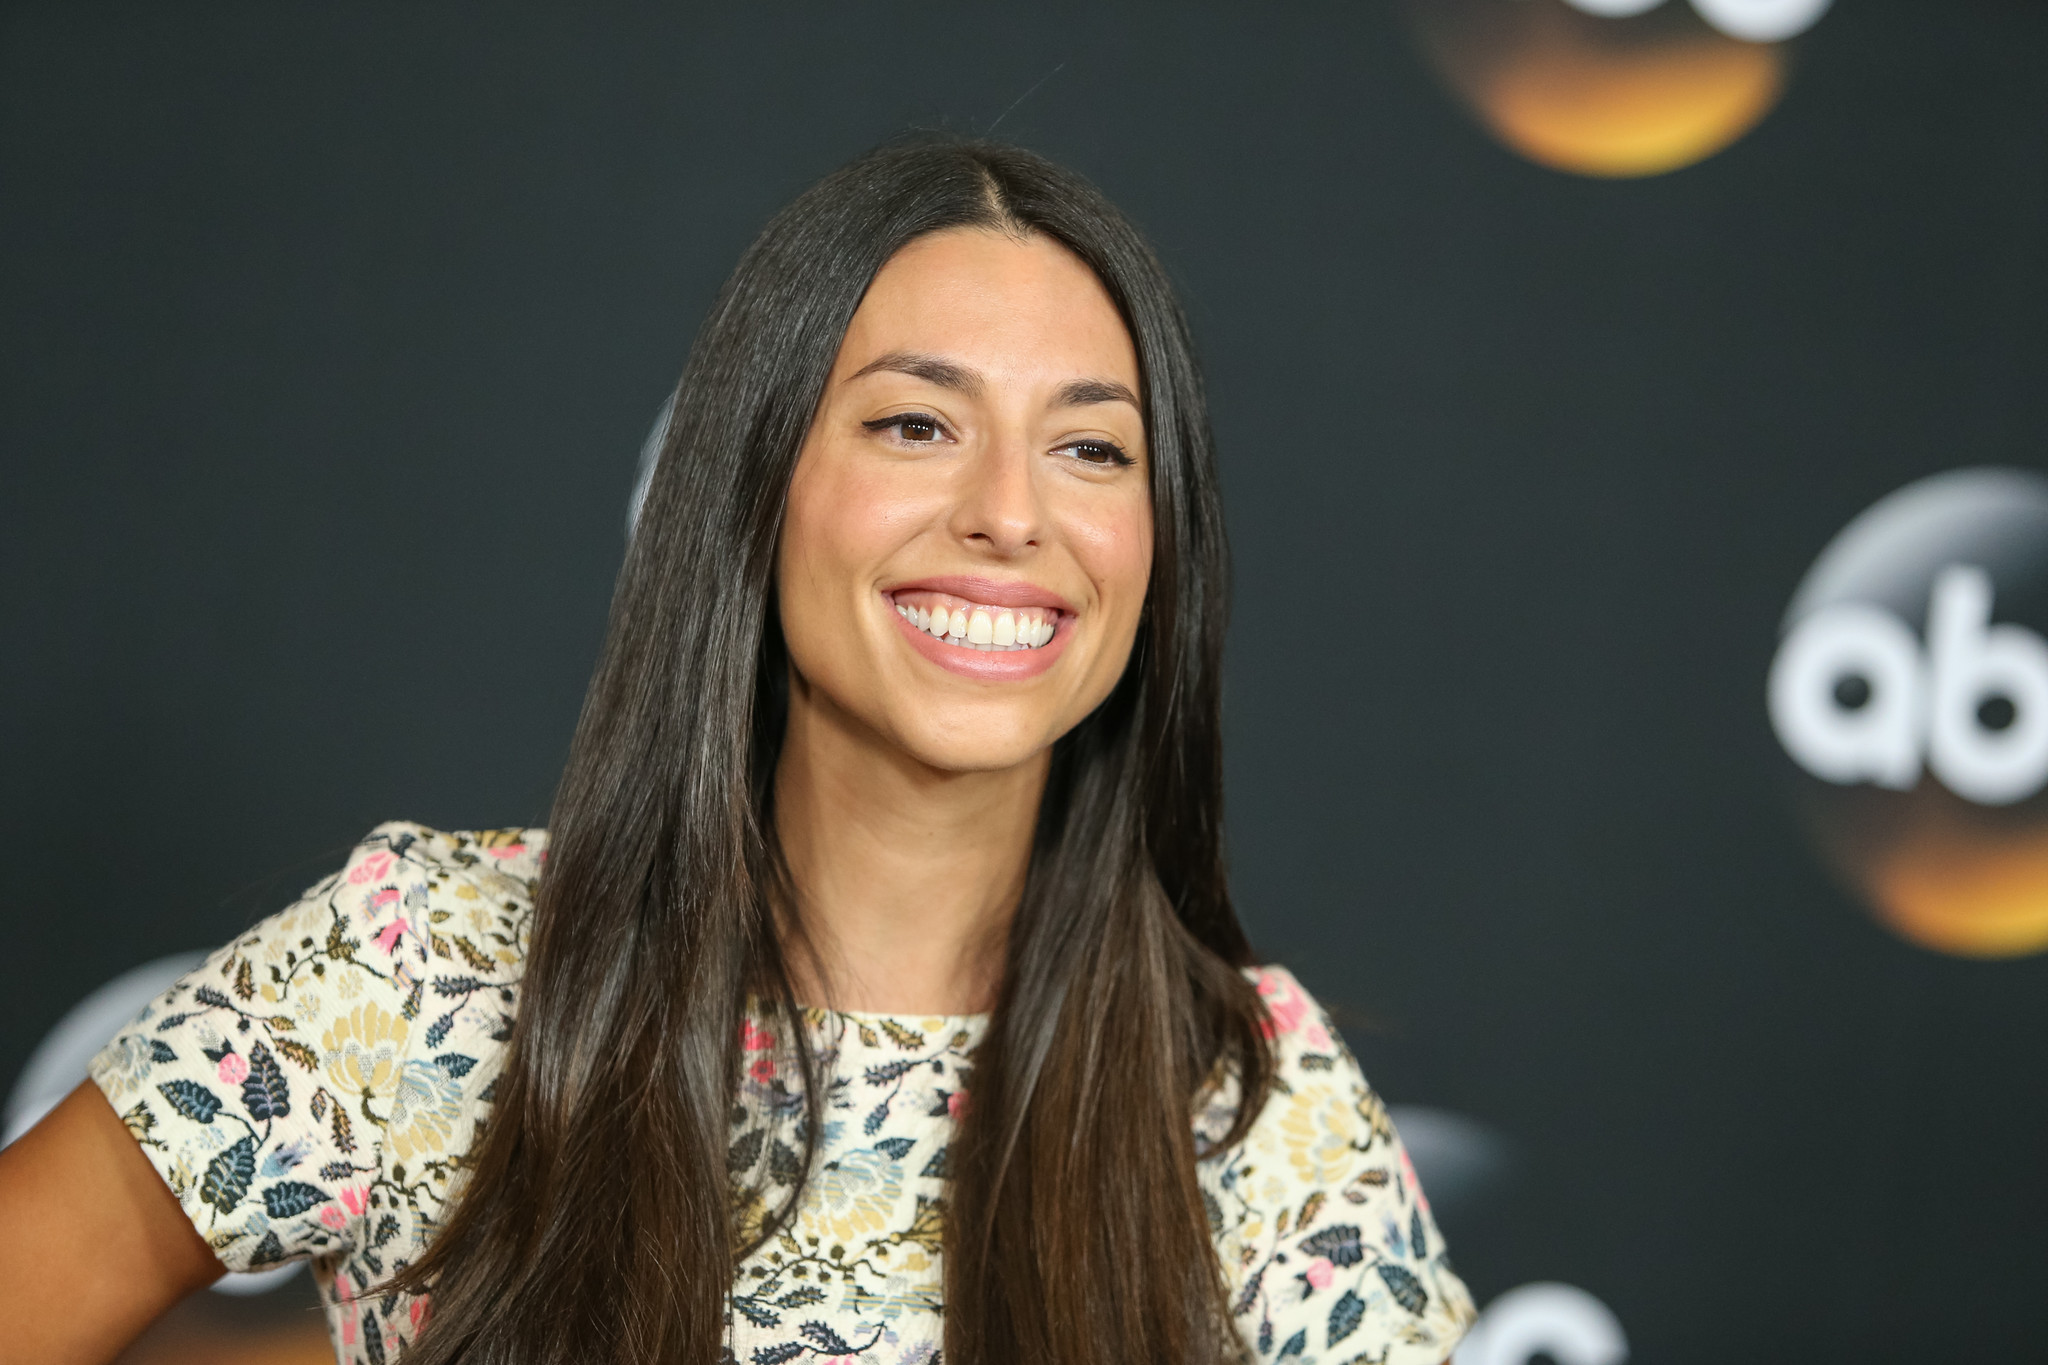 'The Soup' returns with Brazilian-born comic Jade Catta-Preta as host